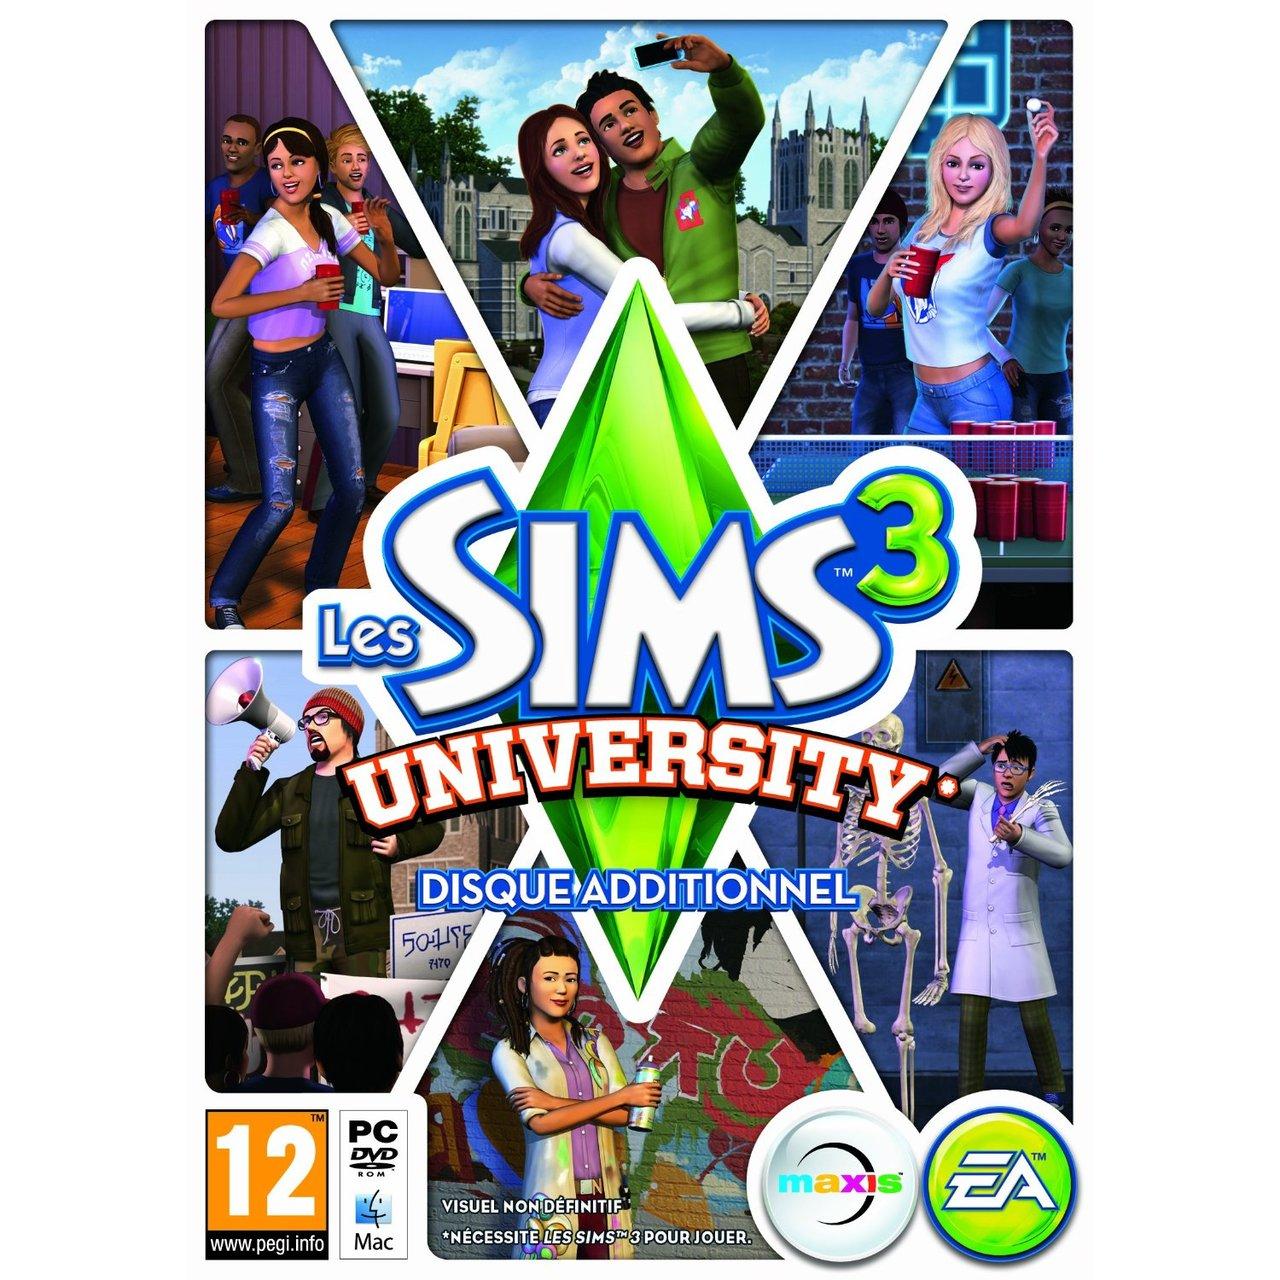 Fifa 14 Cover Xbox One Achat Les Sims 3 : Uni...